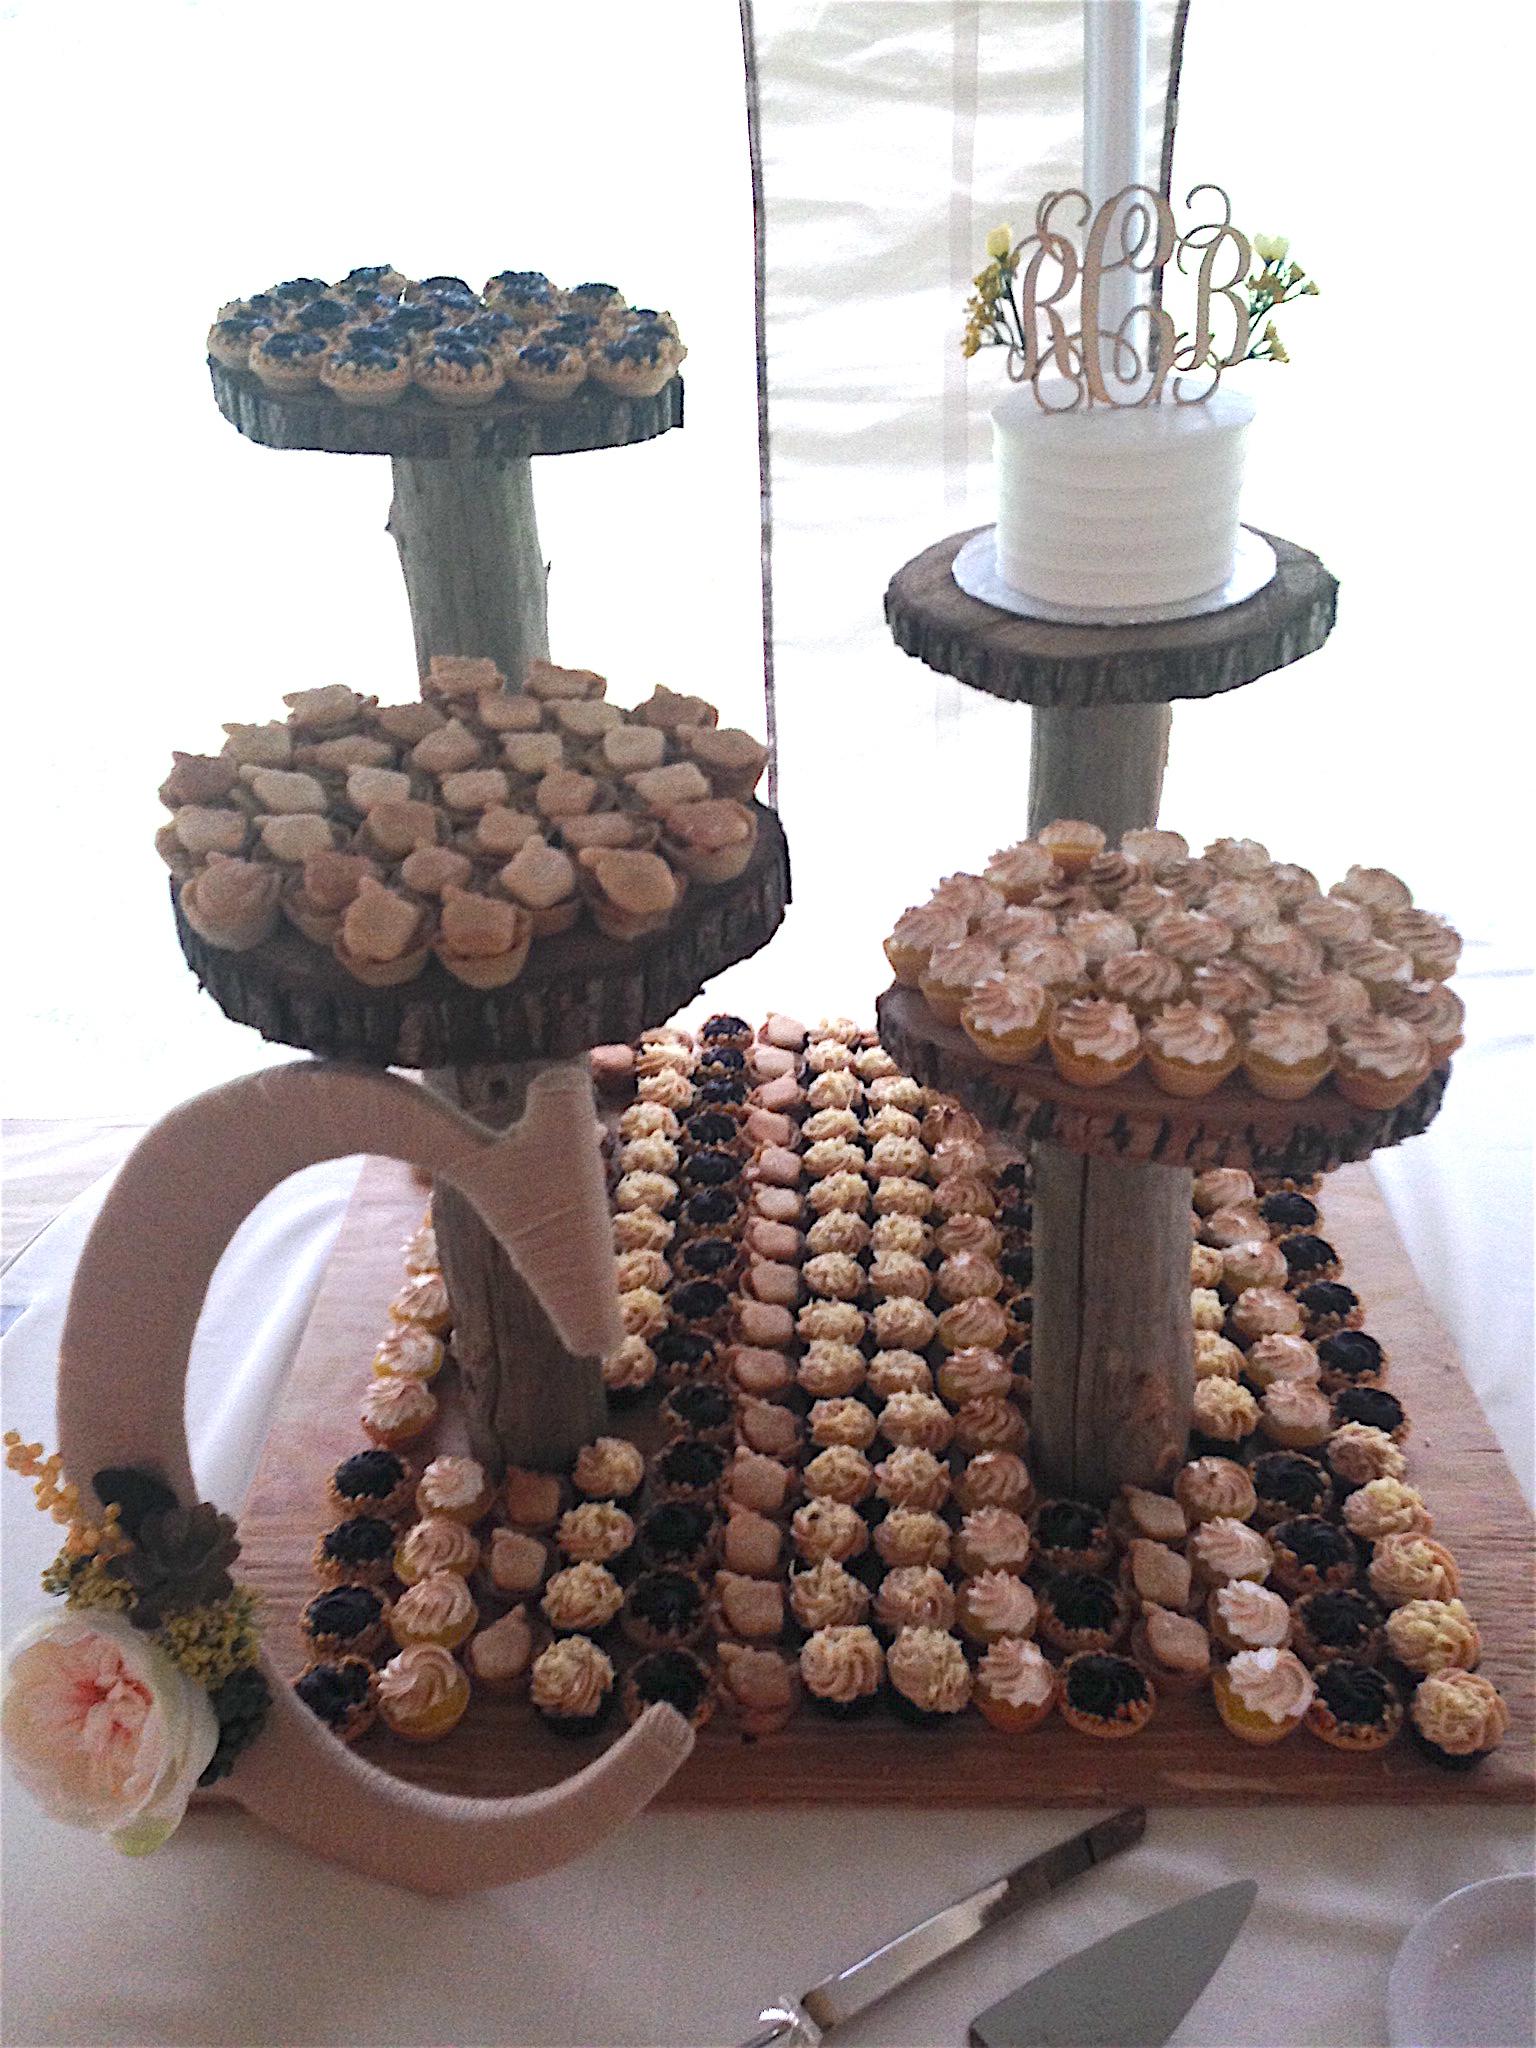 Wedding Cake wPastries3 Display